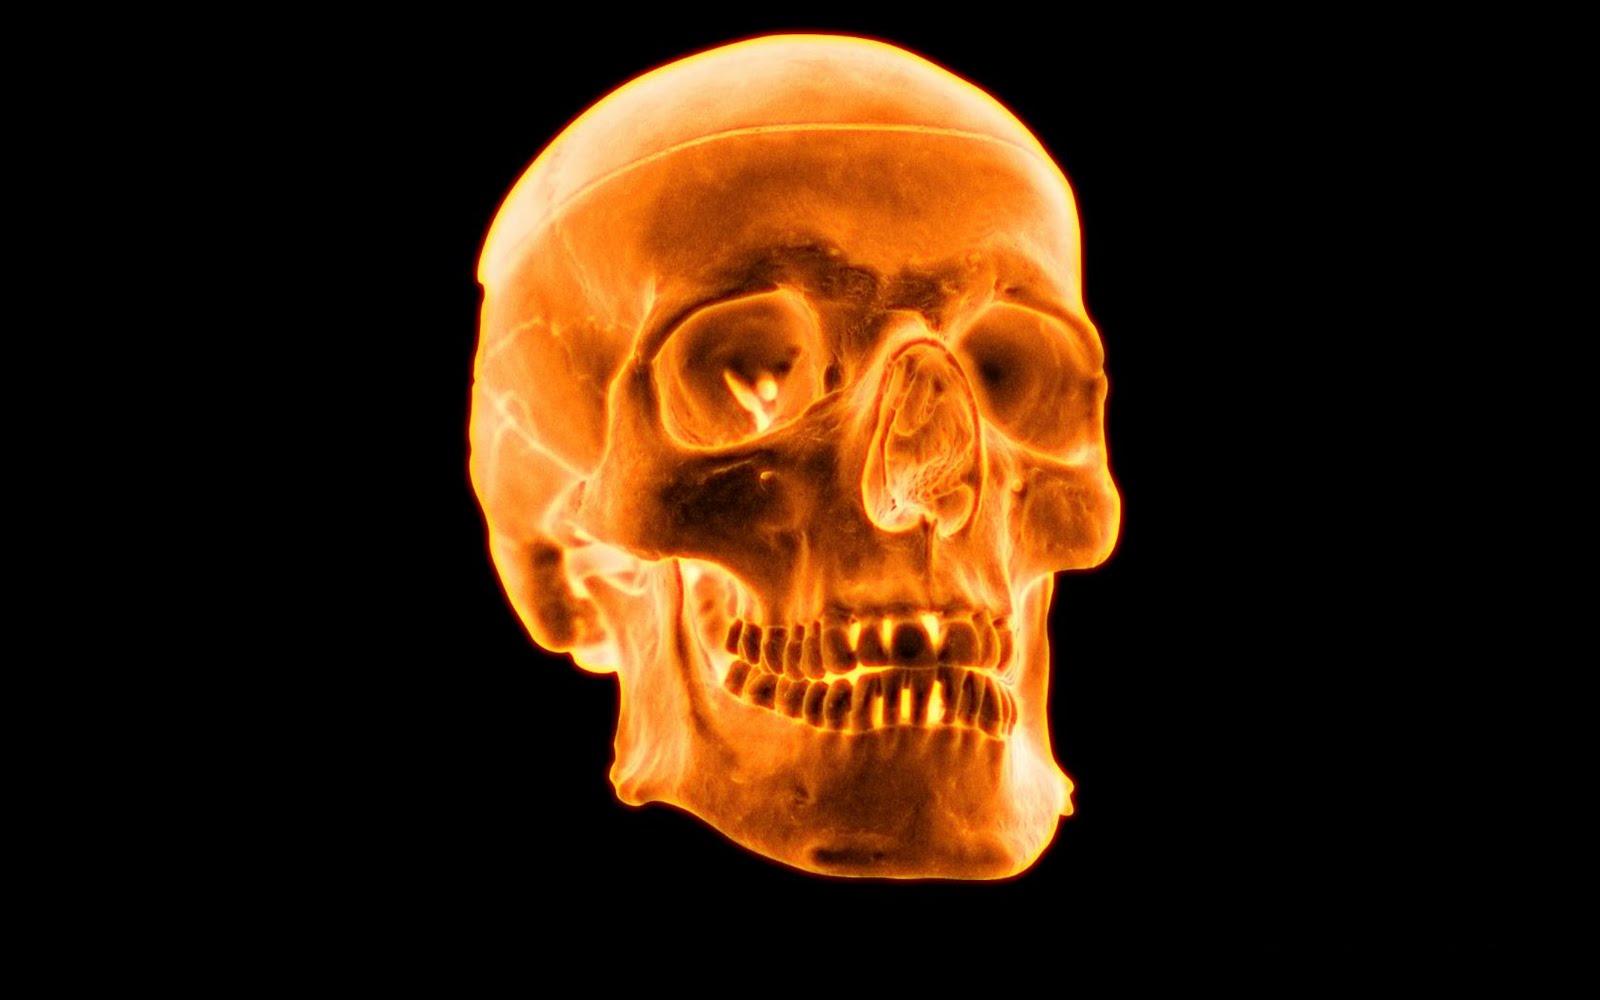 http://1.bp.blogspot.com/_Ym3du2sG3R4/TFyCXS2lQAI/AAAAAAAACuU/Ef7hcsW_MbU/s1600/3D-Fire-Skull+(3).jpg